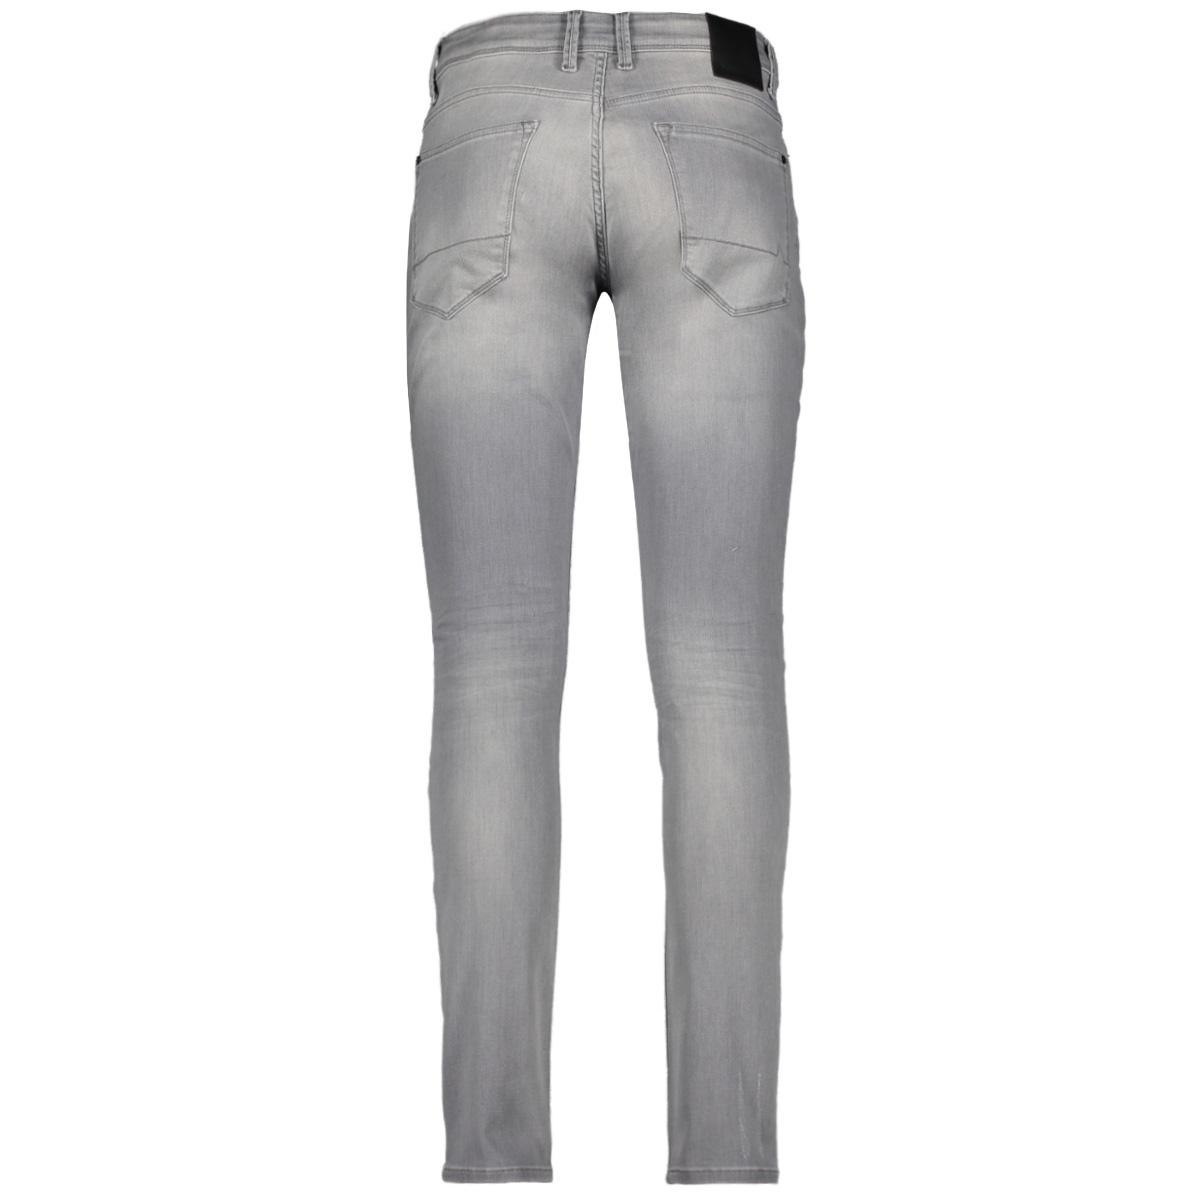 the jone w0127 purewhite jeans grey